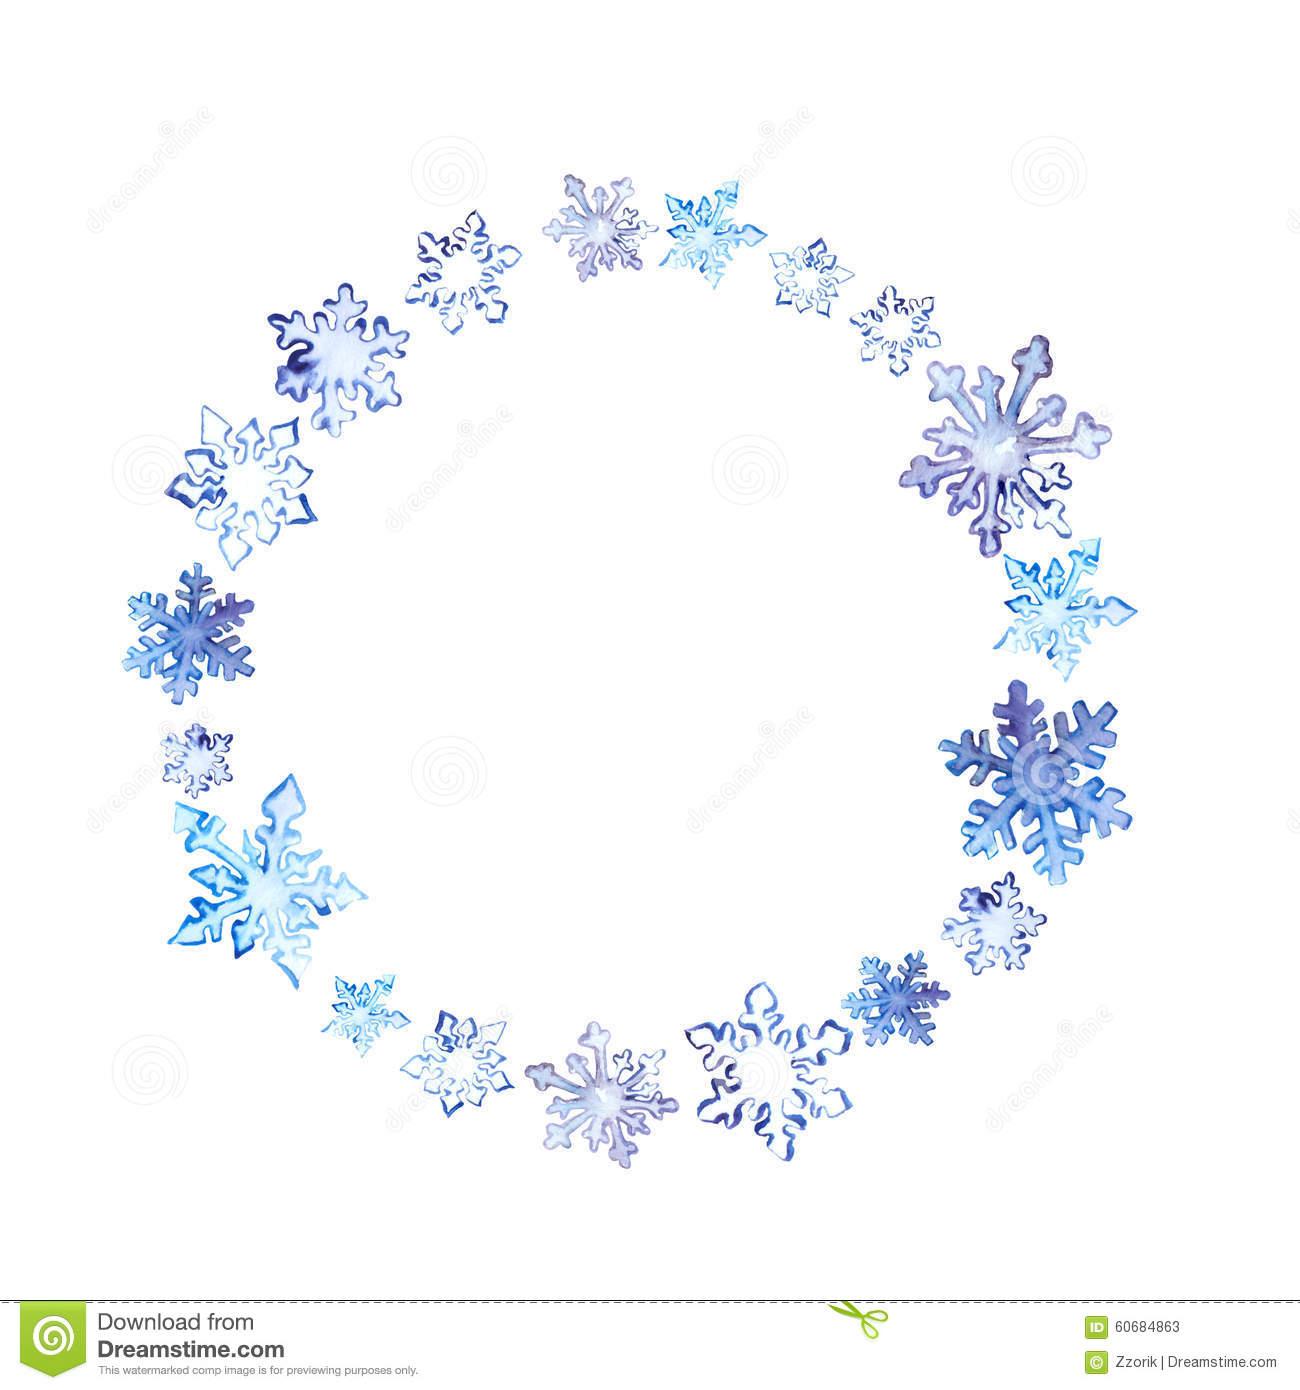 Wreath clipart snowflake Snowflake Snowflake Clipart Clipart Round